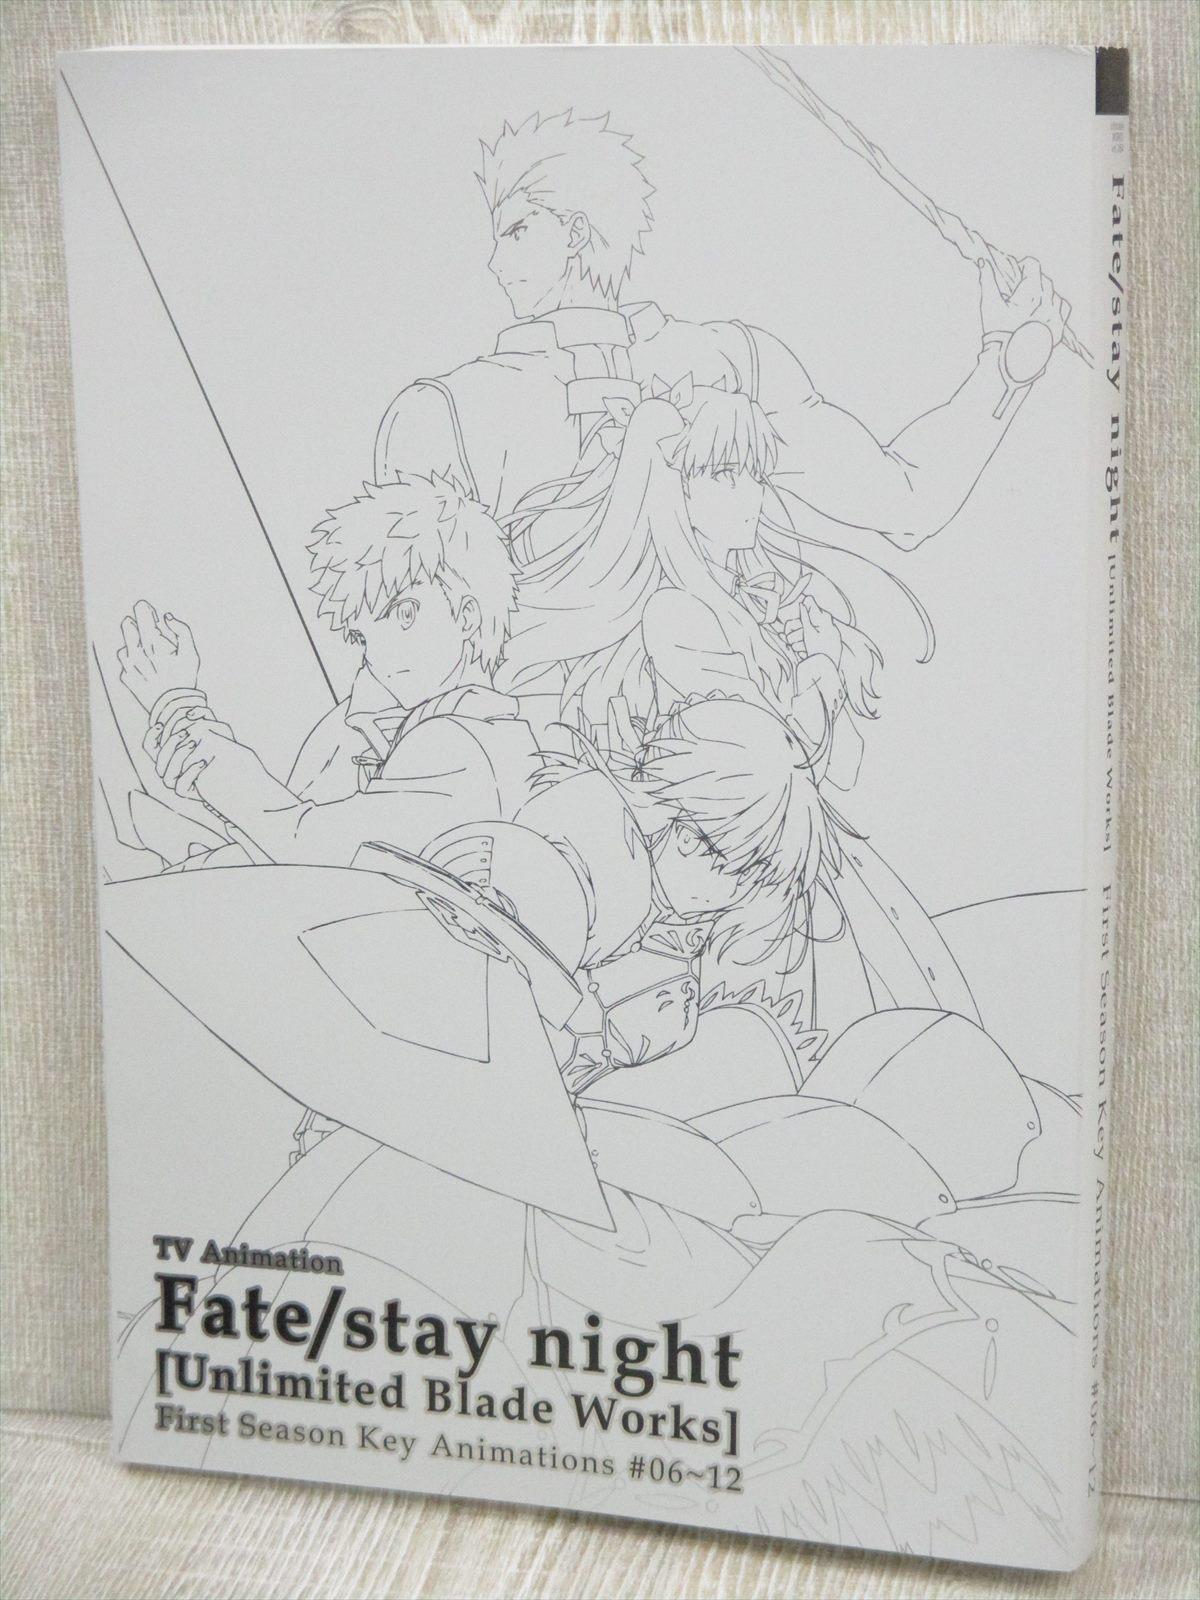 FATE STAY NIGHT Unlimited Blade Works 1st Season 06-12 Key Animation Art Book FS